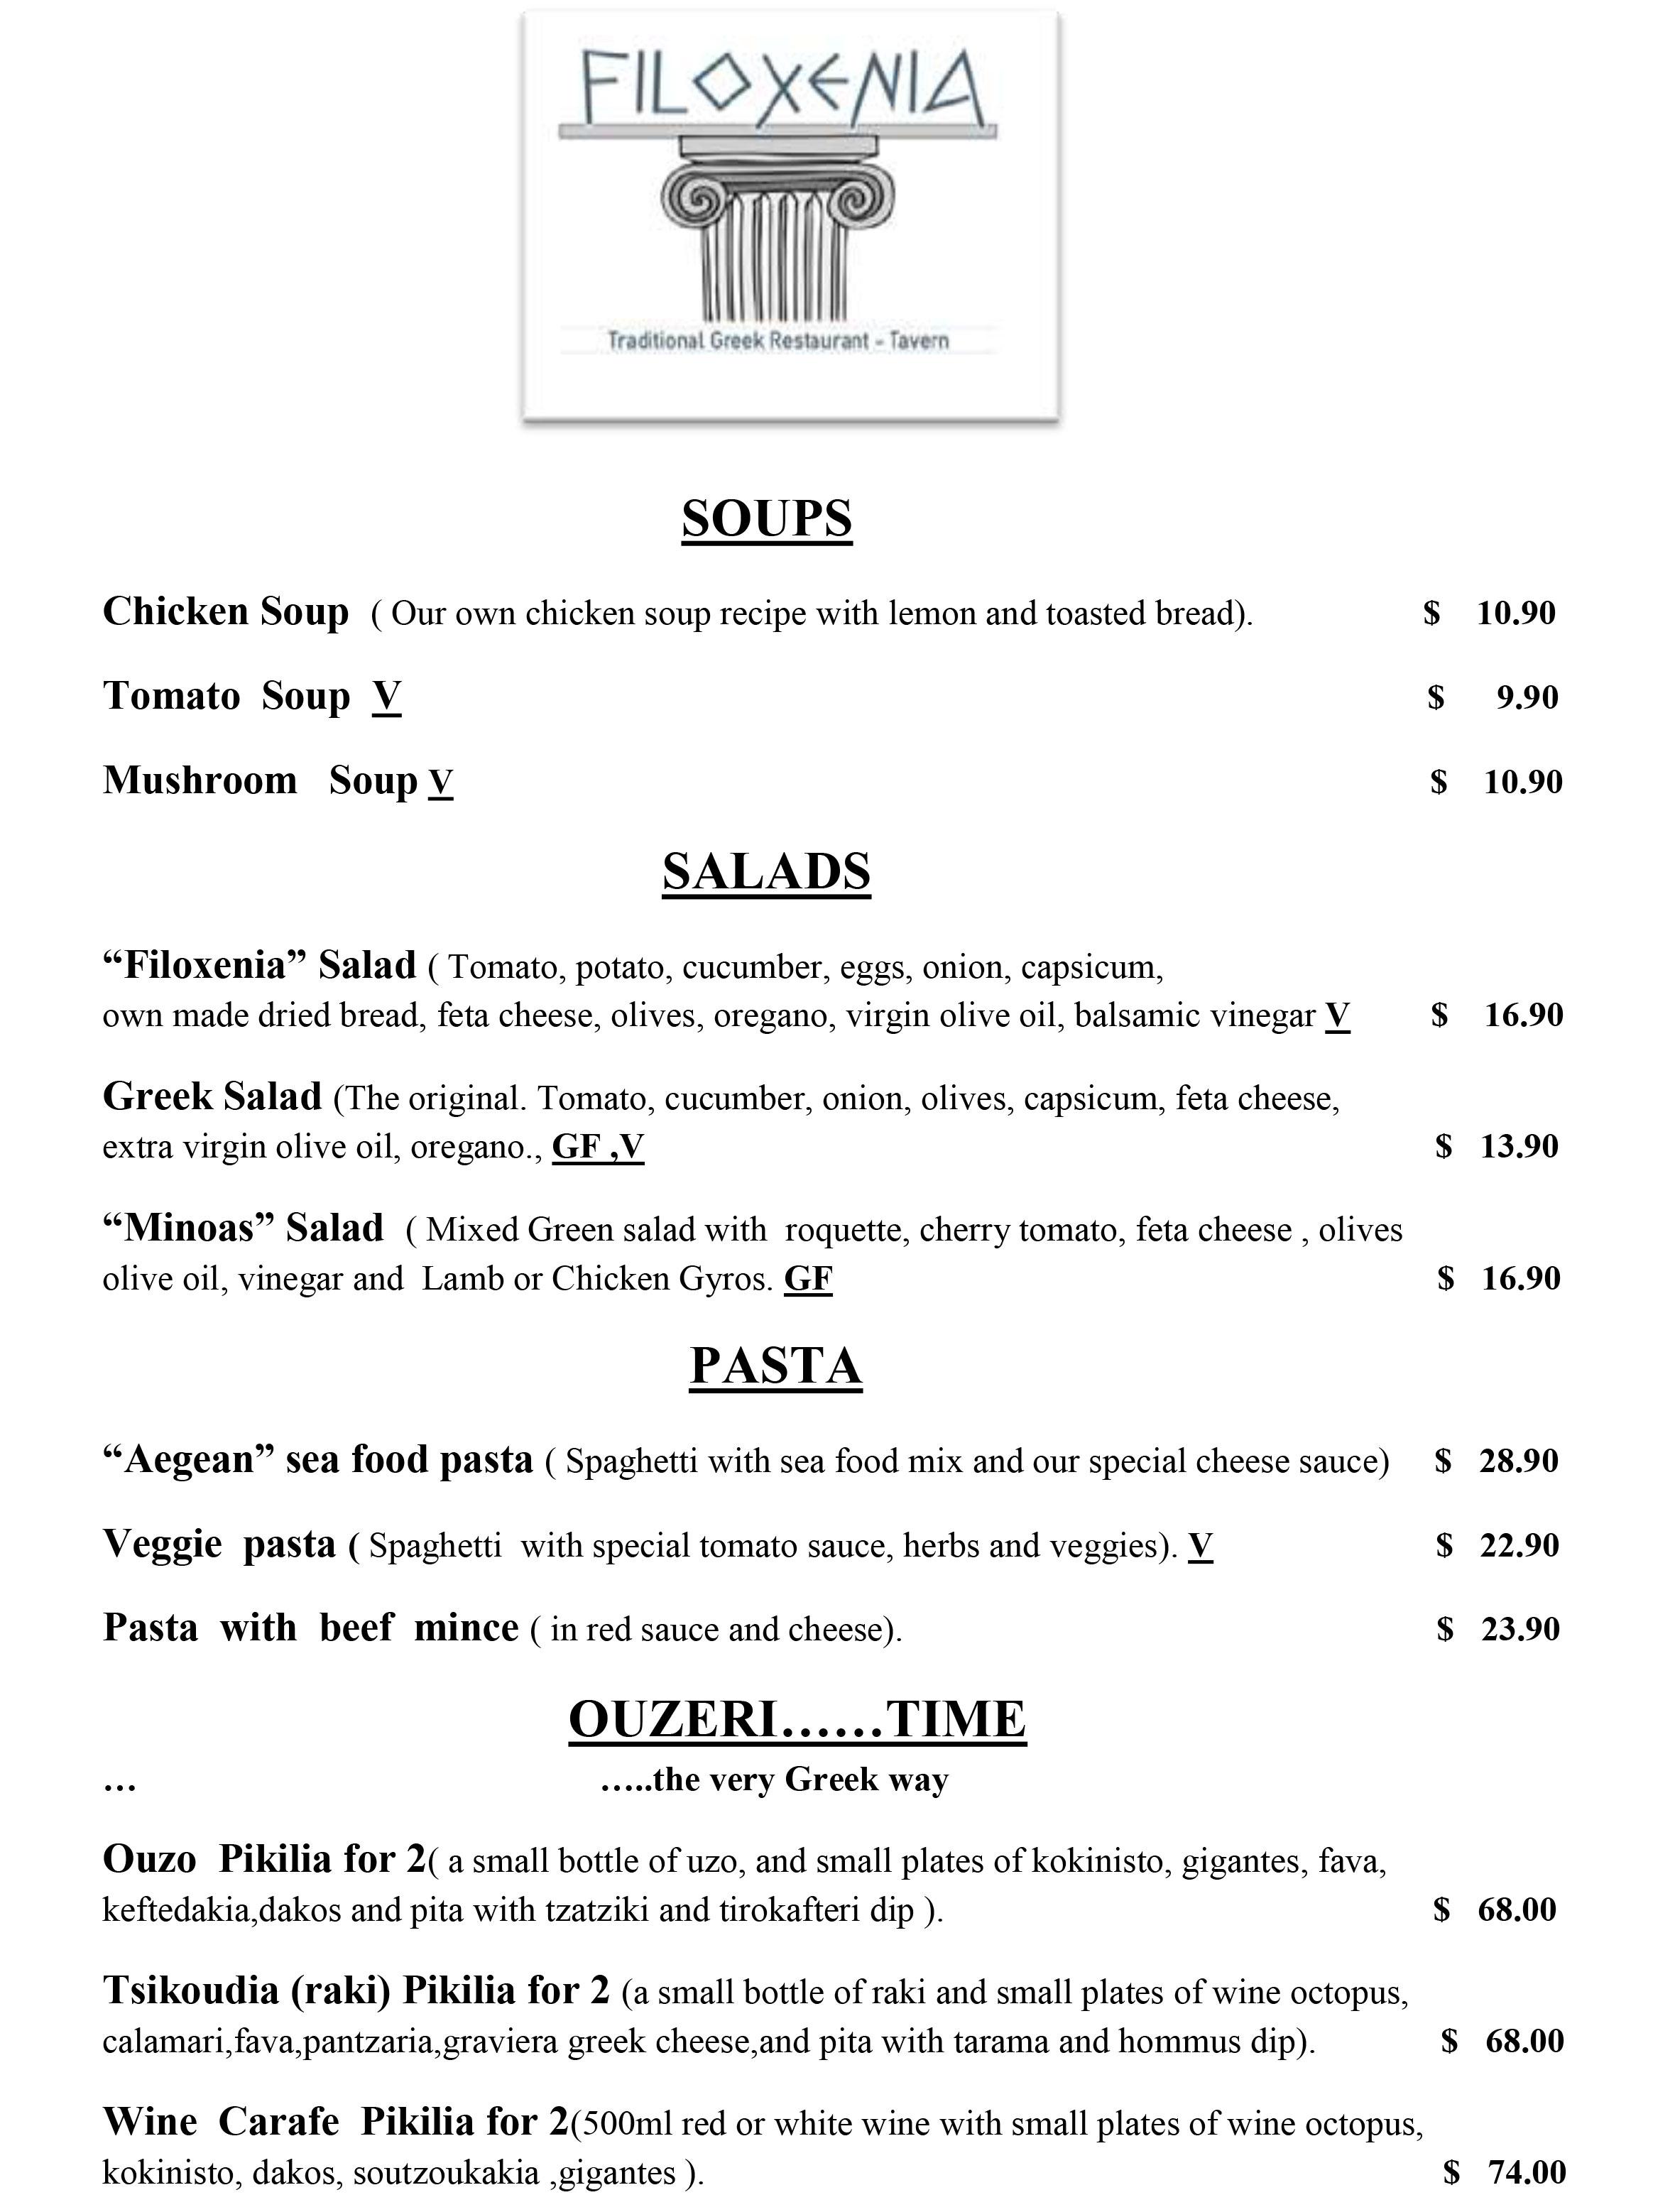 Filoxenia-restaurant-menu-price-list